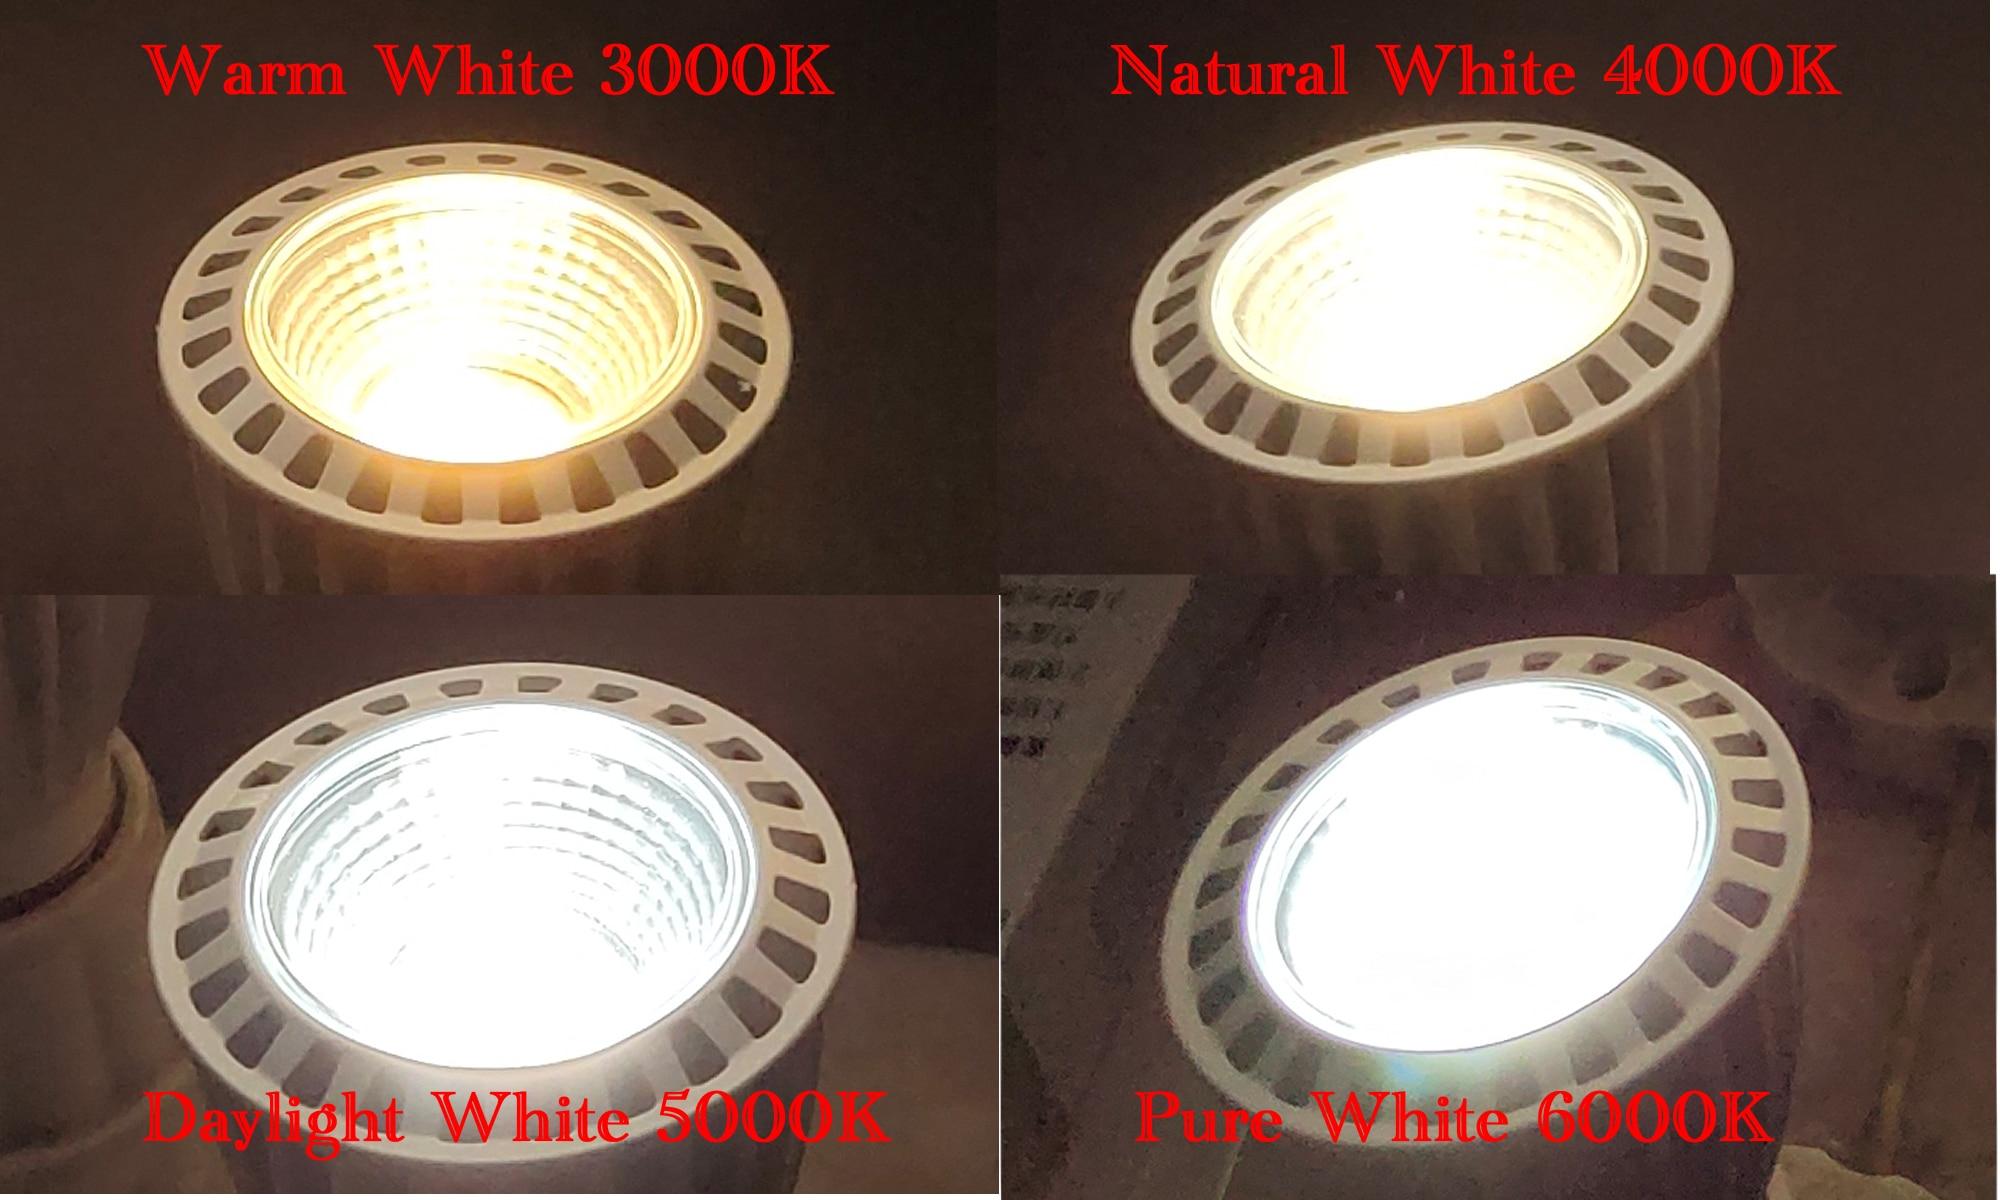 High CRI RA95 E27 7W COB LED Bulb Lamp LED Spotlight Downlight Lamp AC85V-265V Daylight White 5000K For Room Kitchen Studio